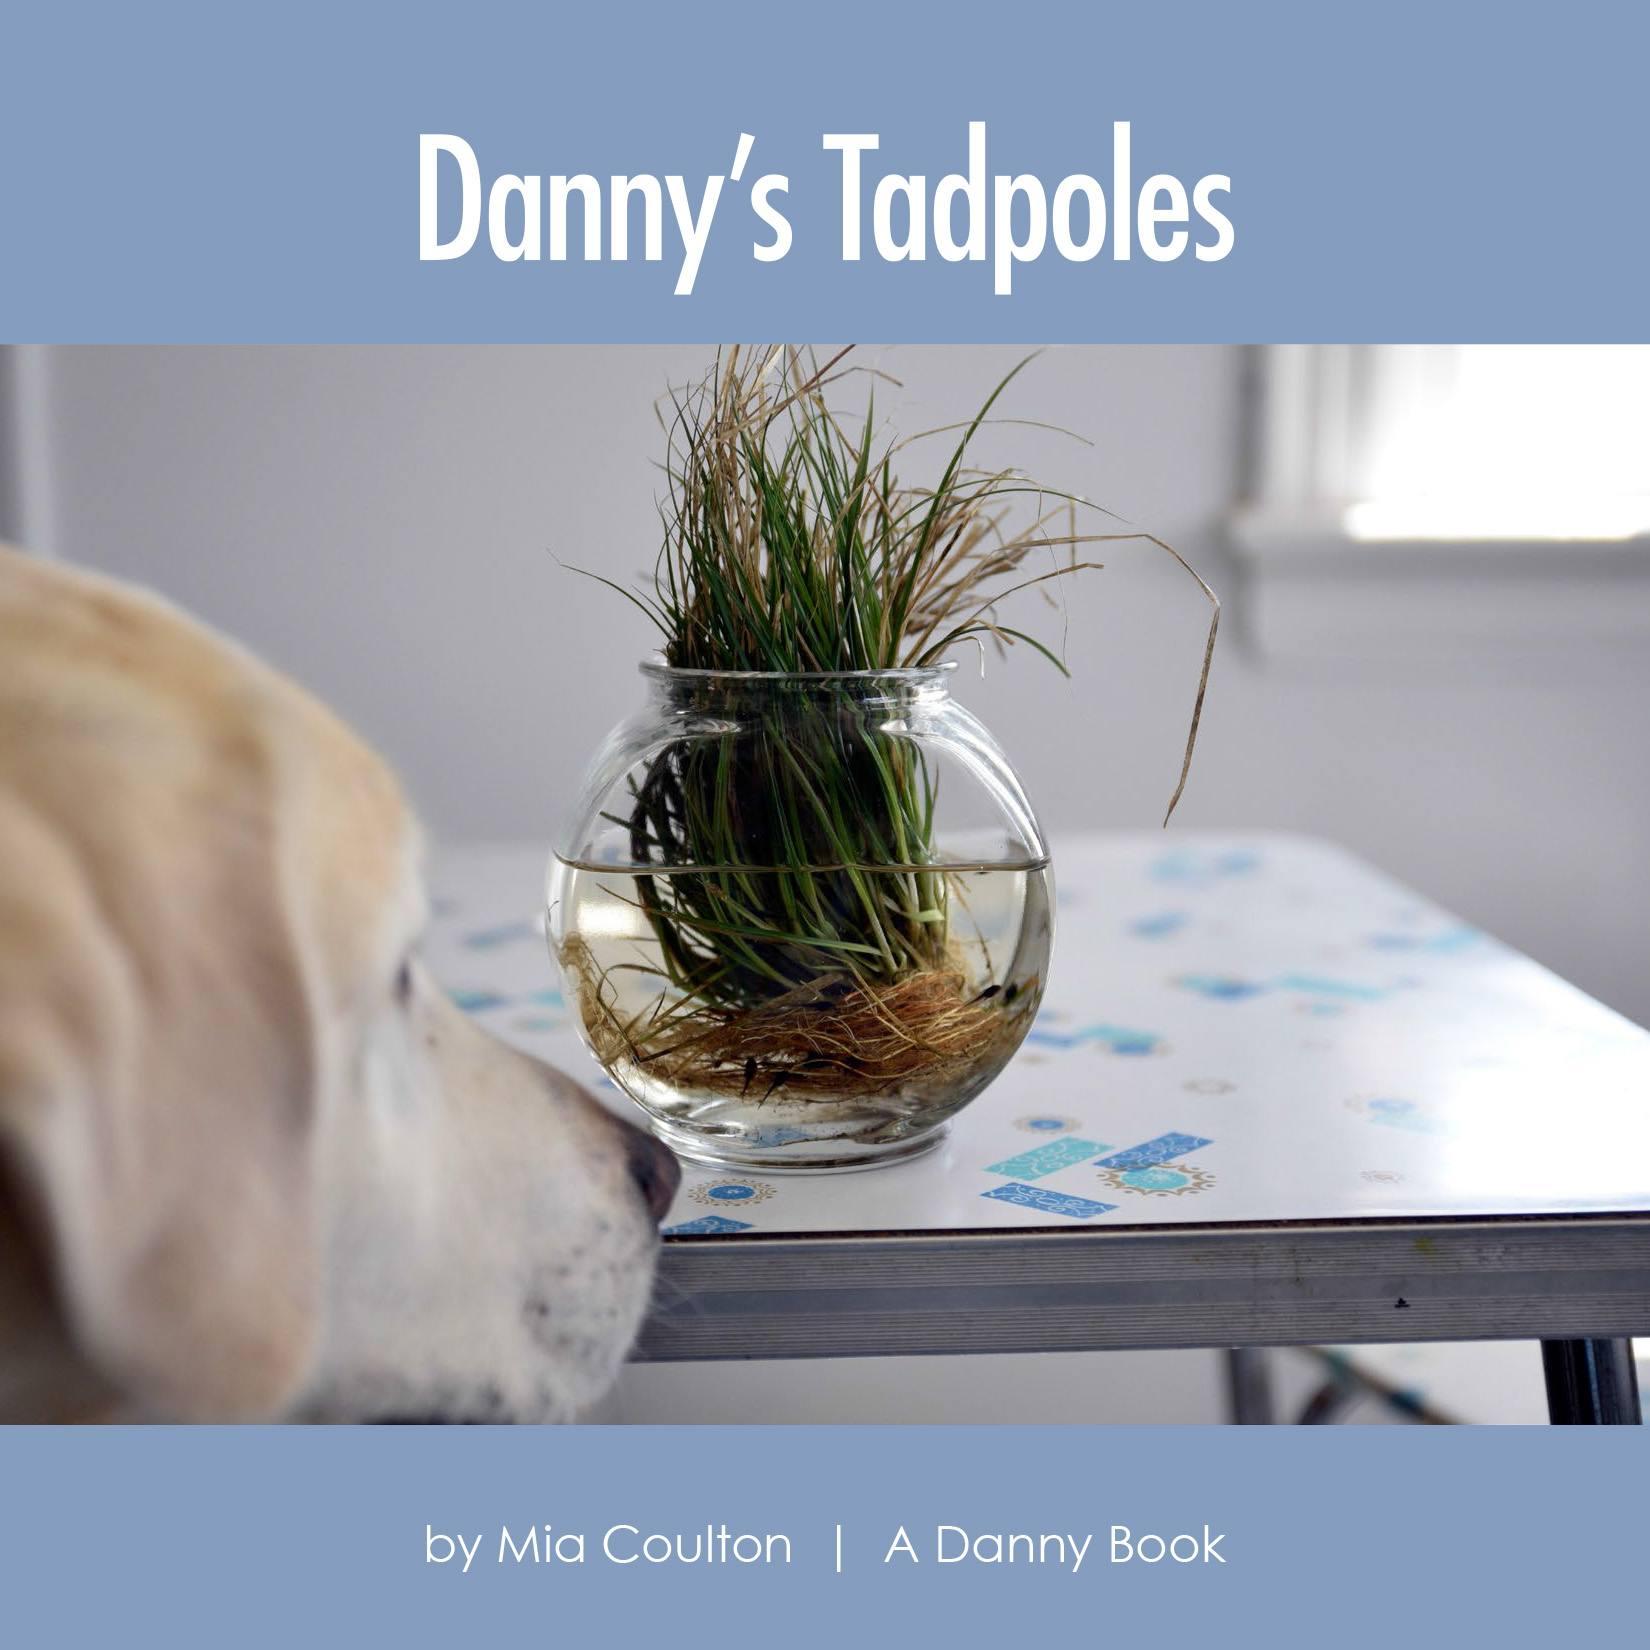 CVR_DanDanny's Tadpoles Cover